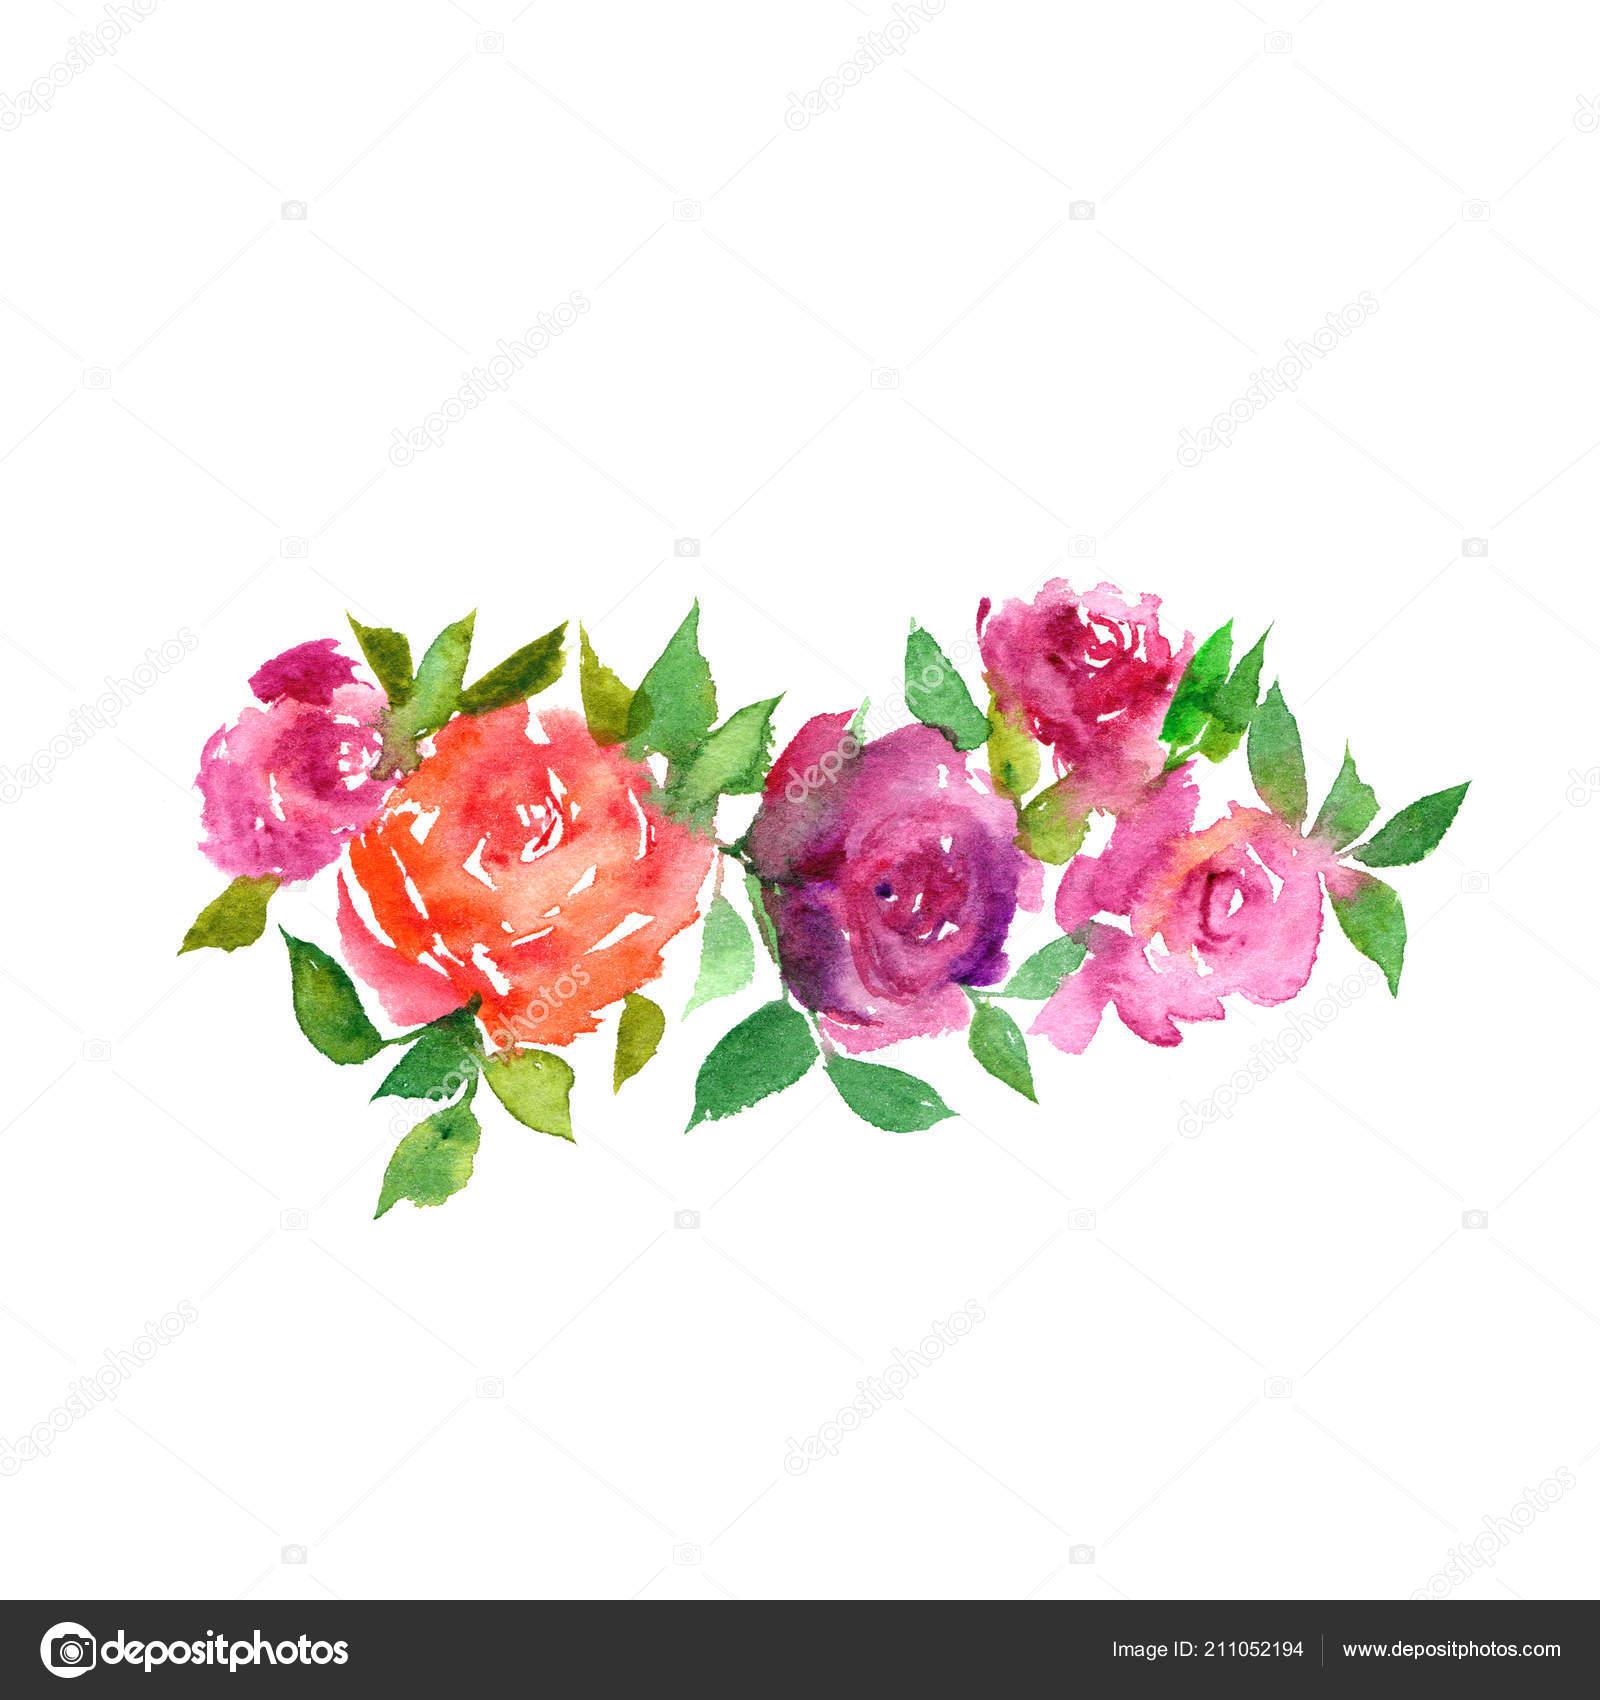 watercolor flowers floral set decor pink painting flowers decorative